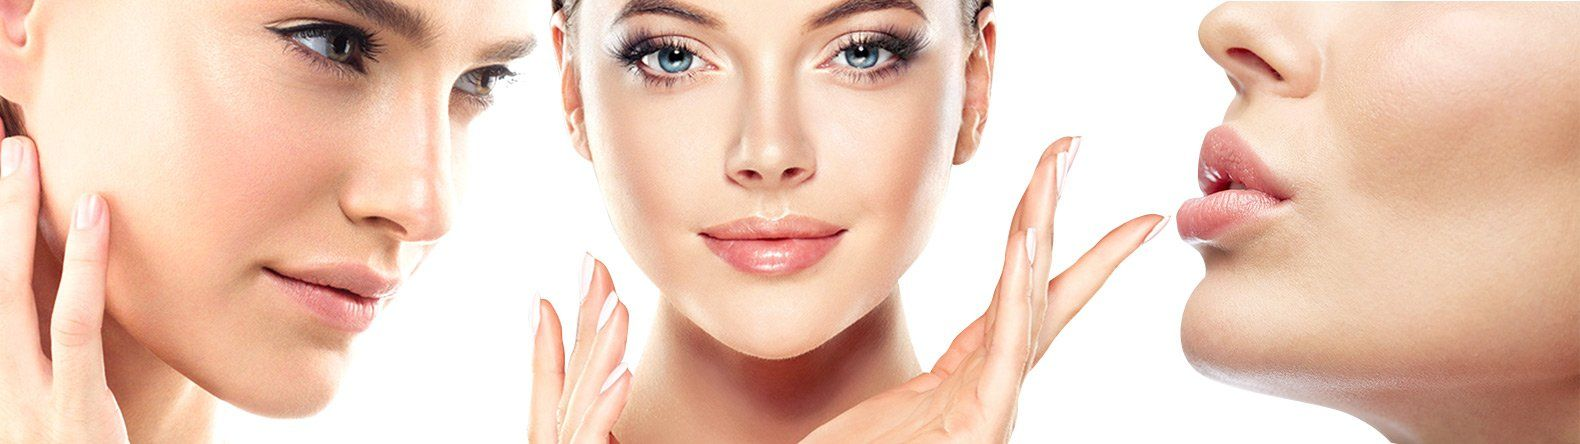 Jo J. reccomend Facial plastic surgeons bonita springs fl